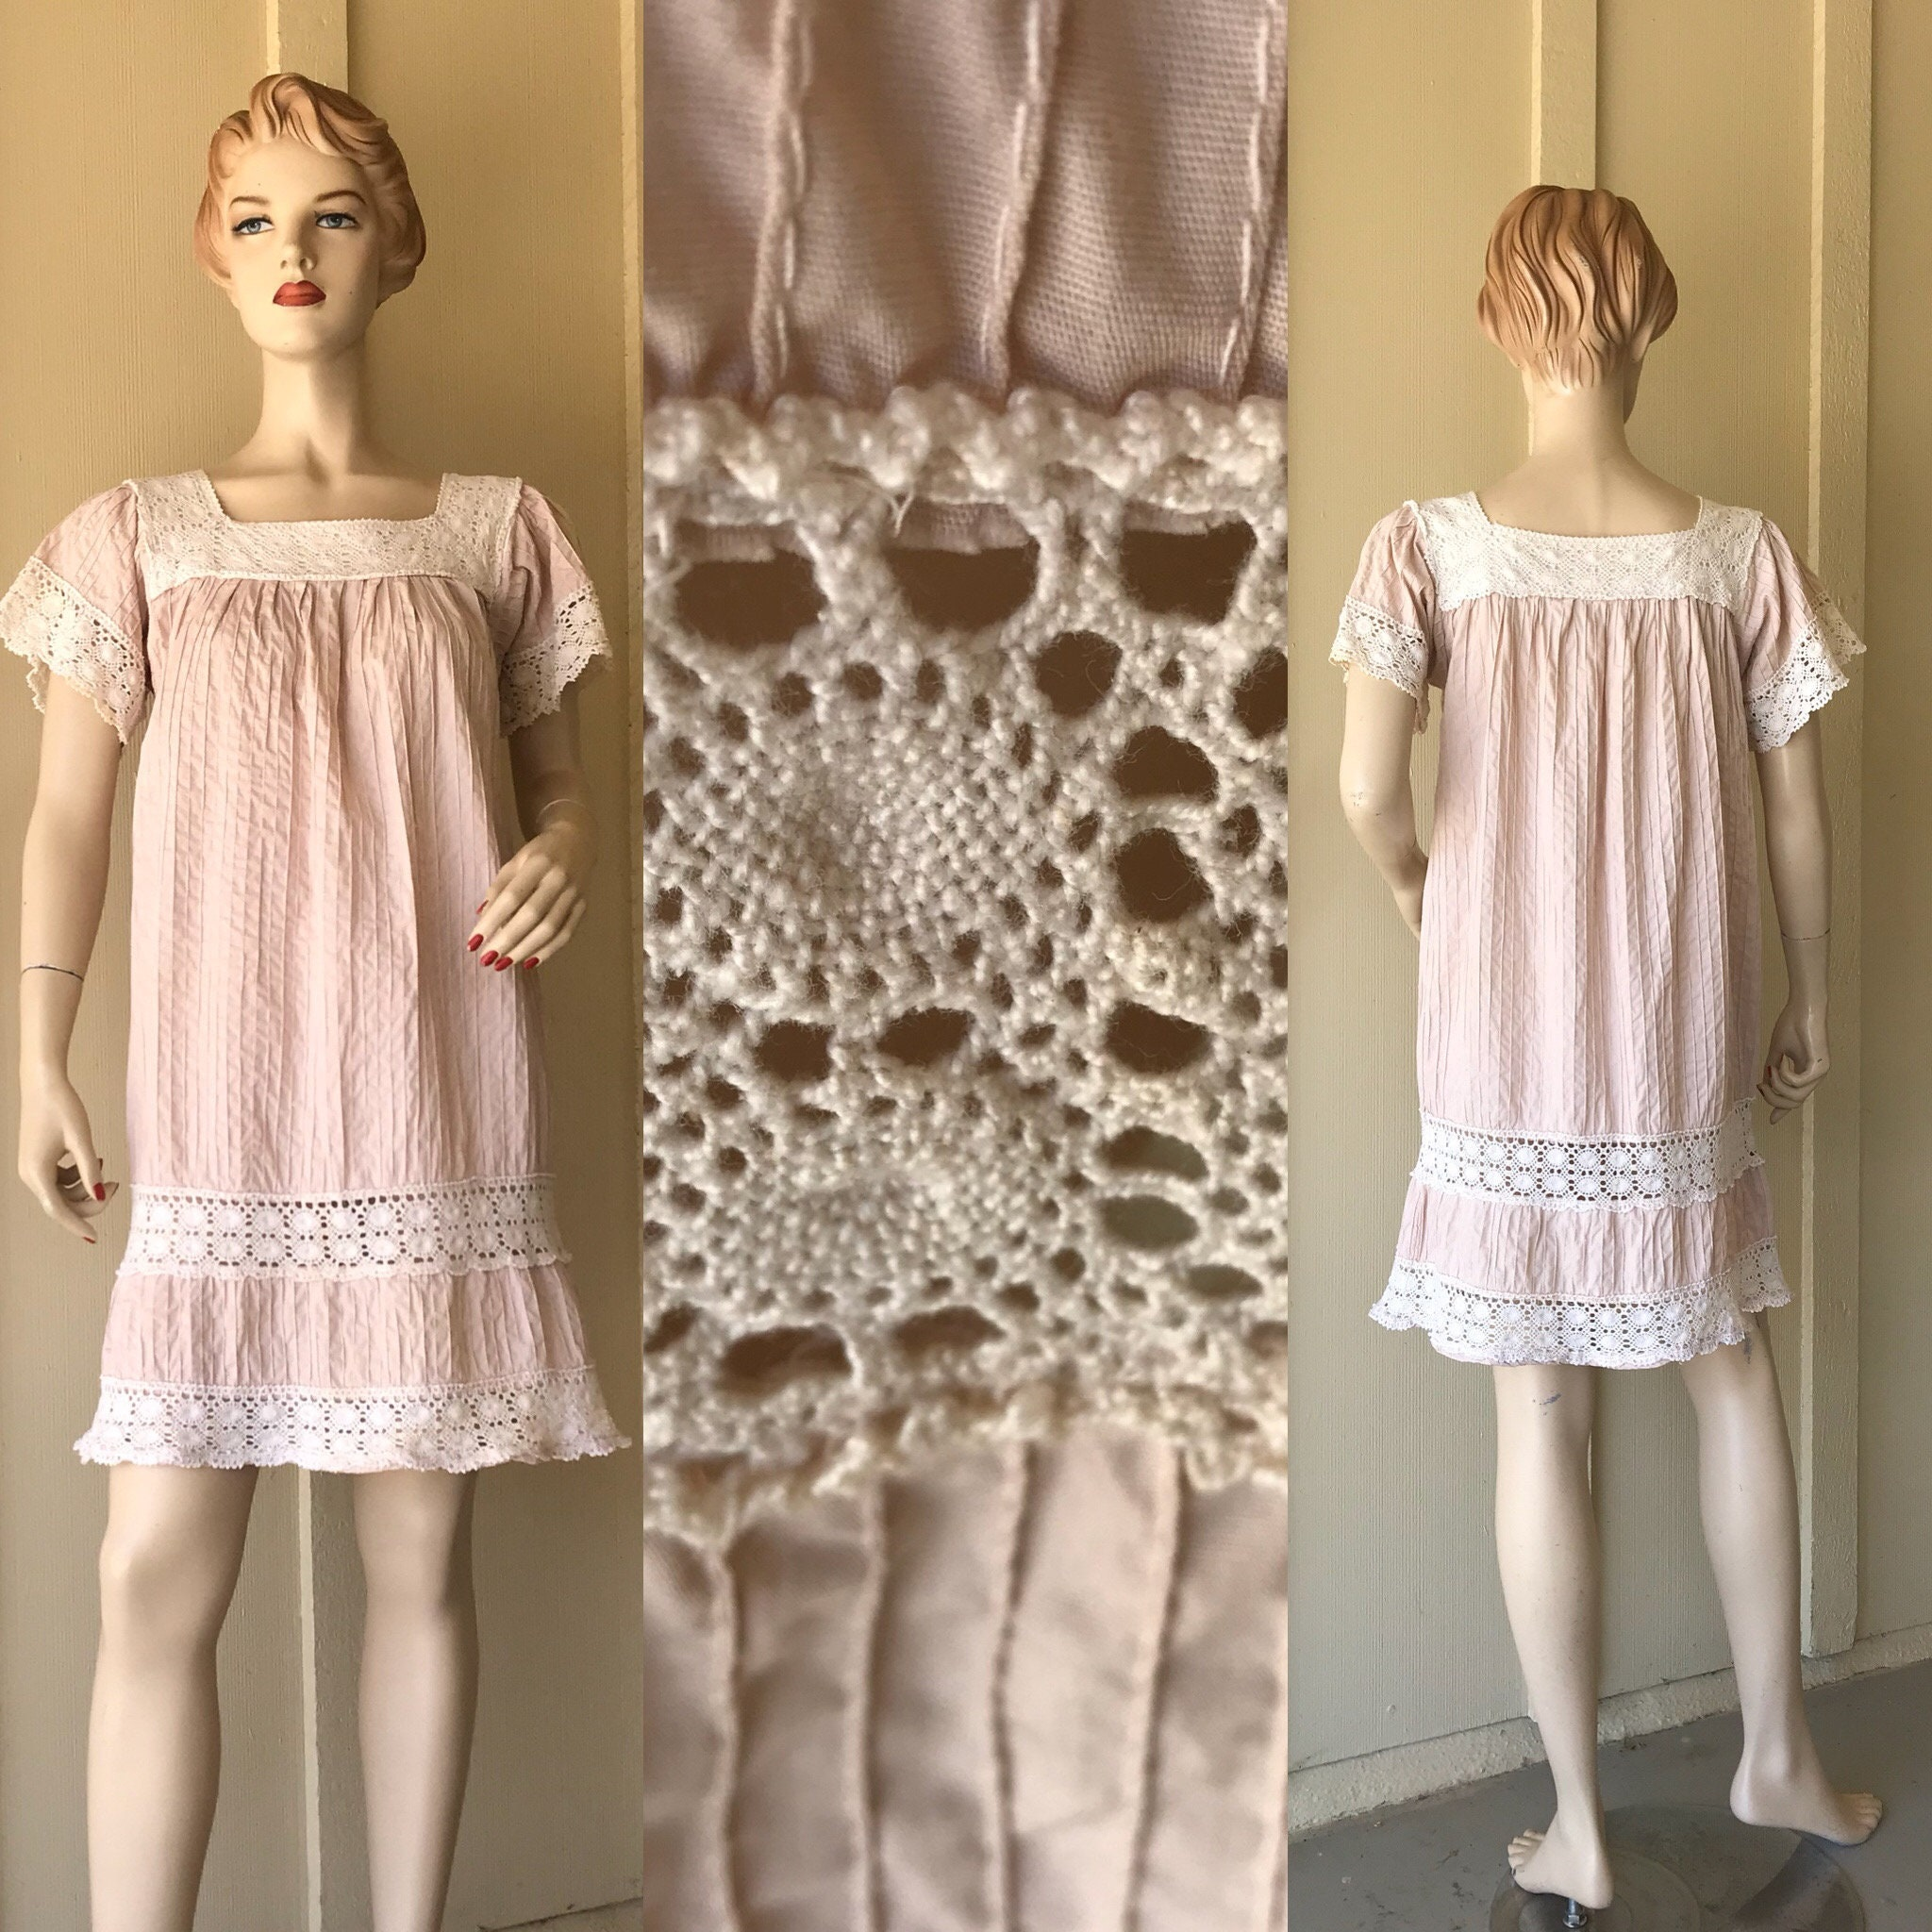 b90e273acfad Vintage mexican dress peasant hippie dress short etsy jpg 2048x2048 Vintage  mexican fashion